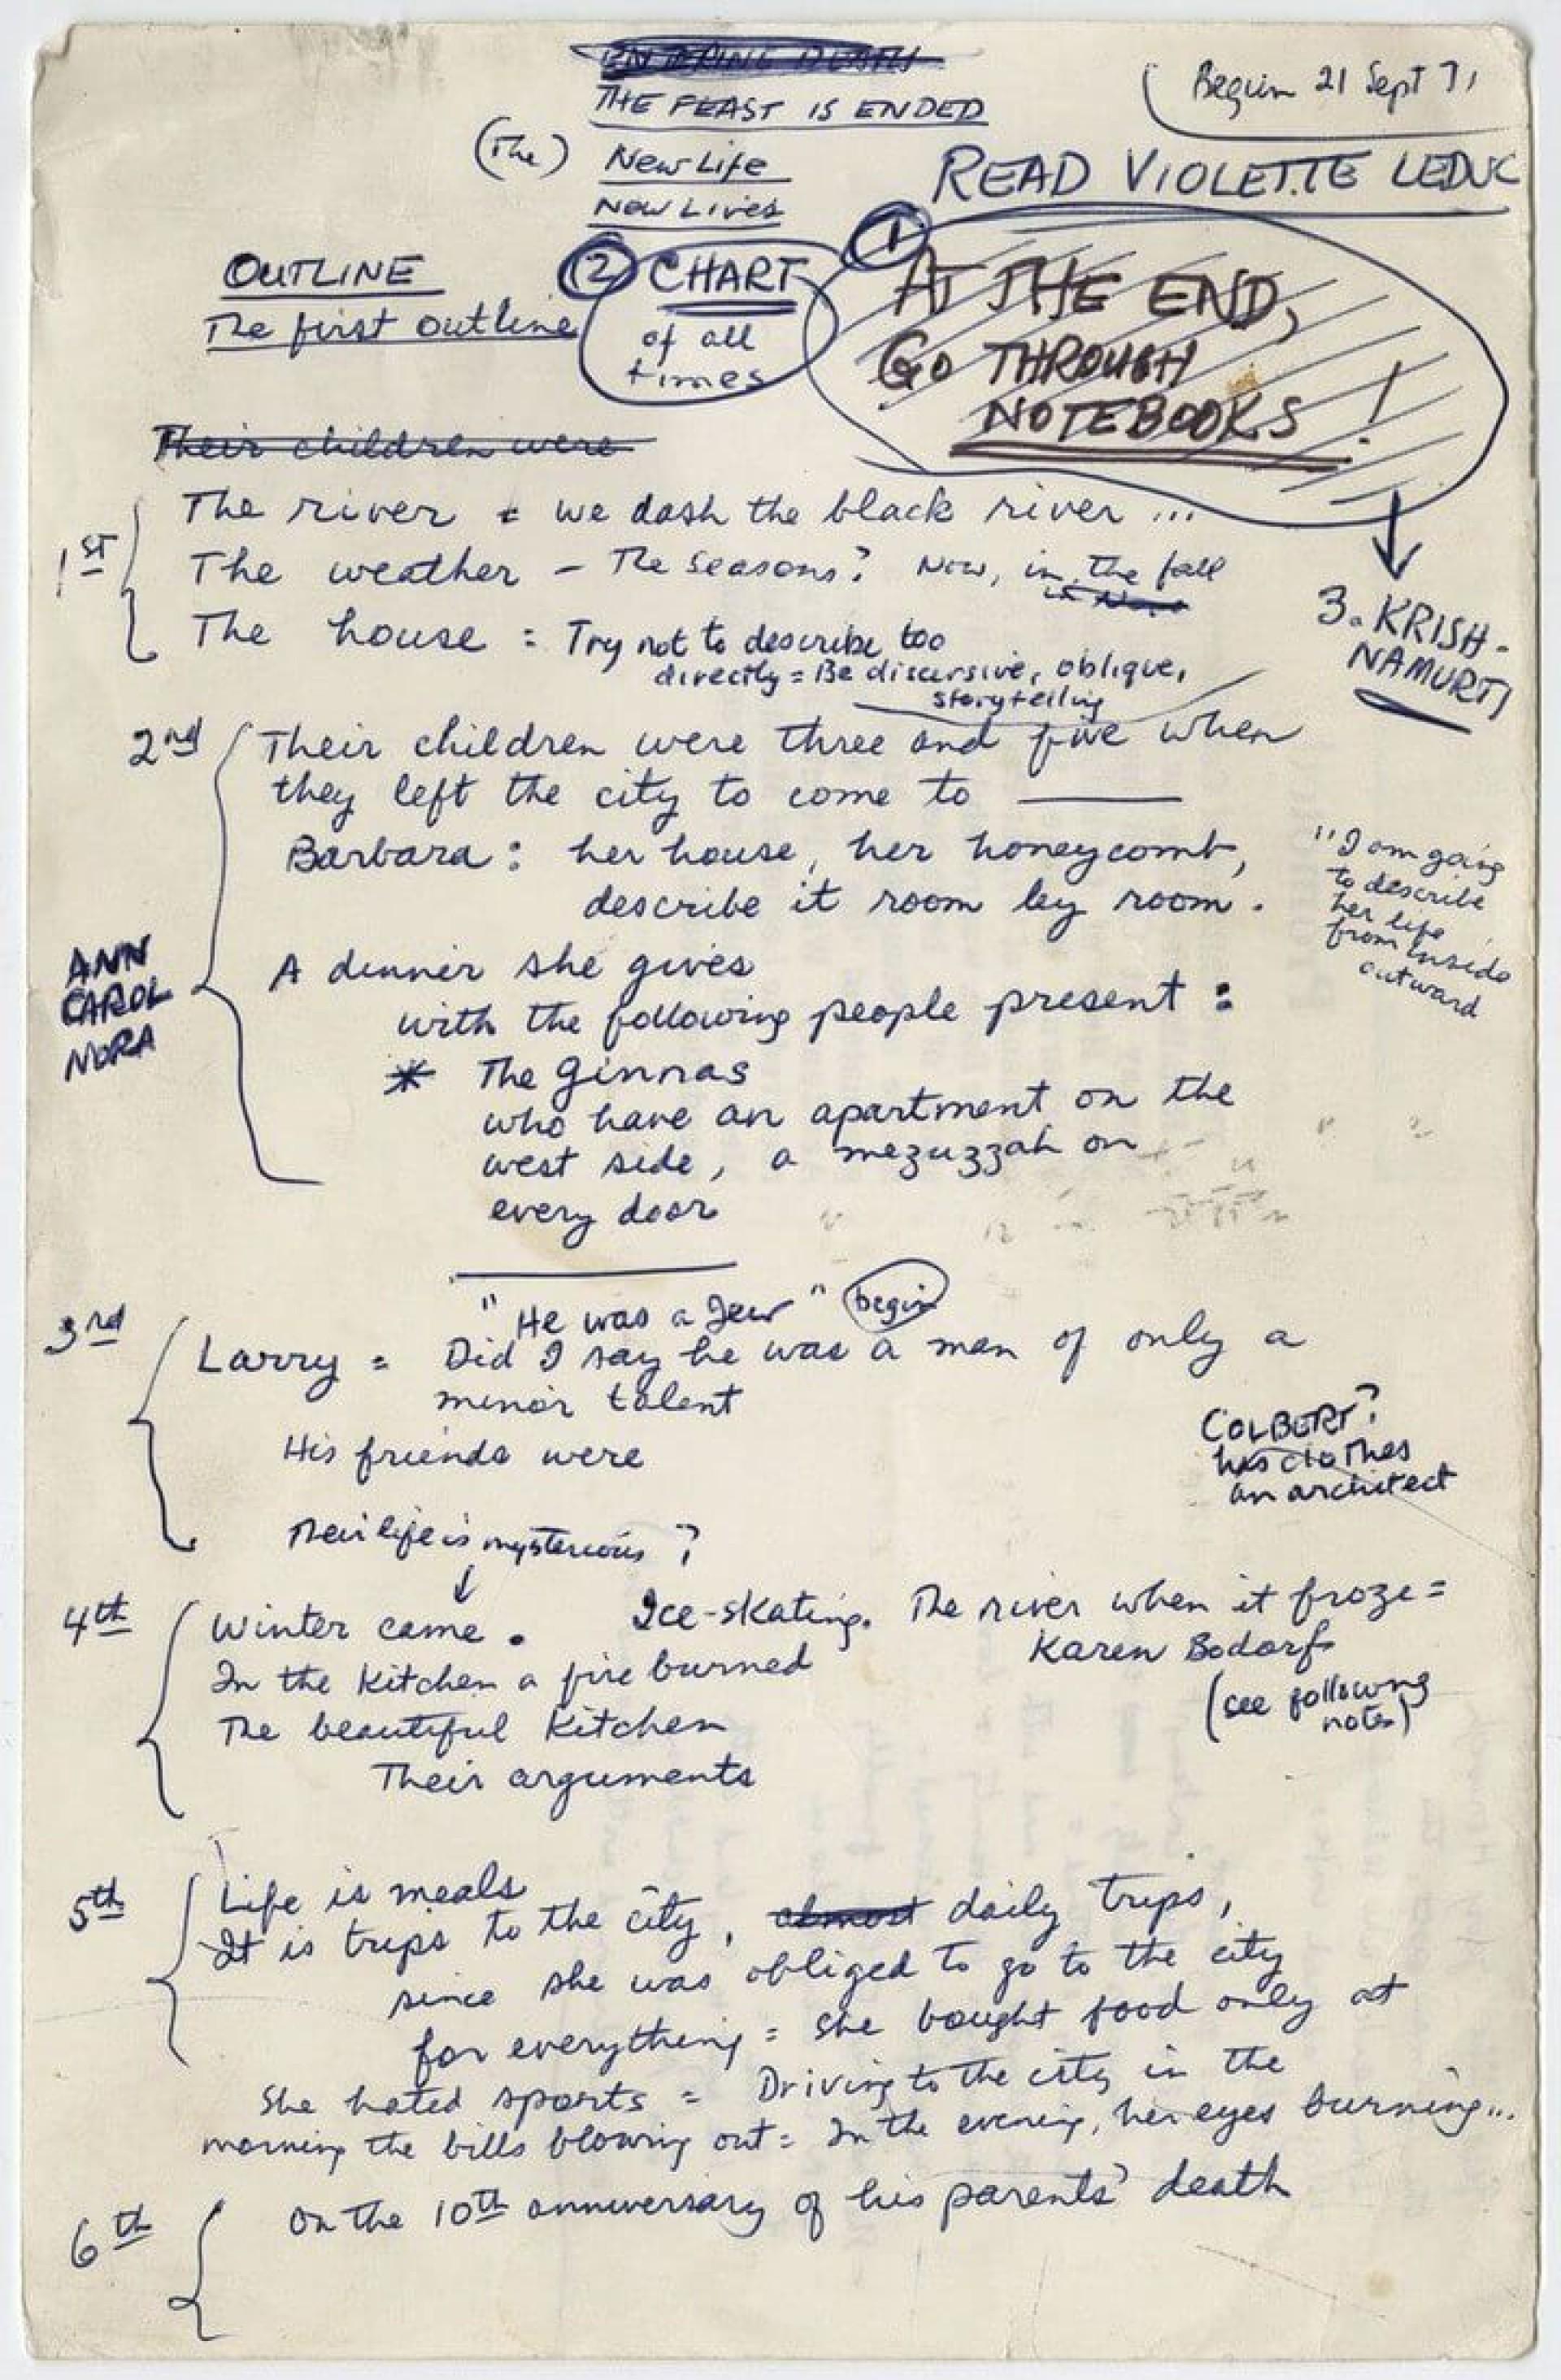 006 Rare Writing A Novel Outline Template Sample 1920